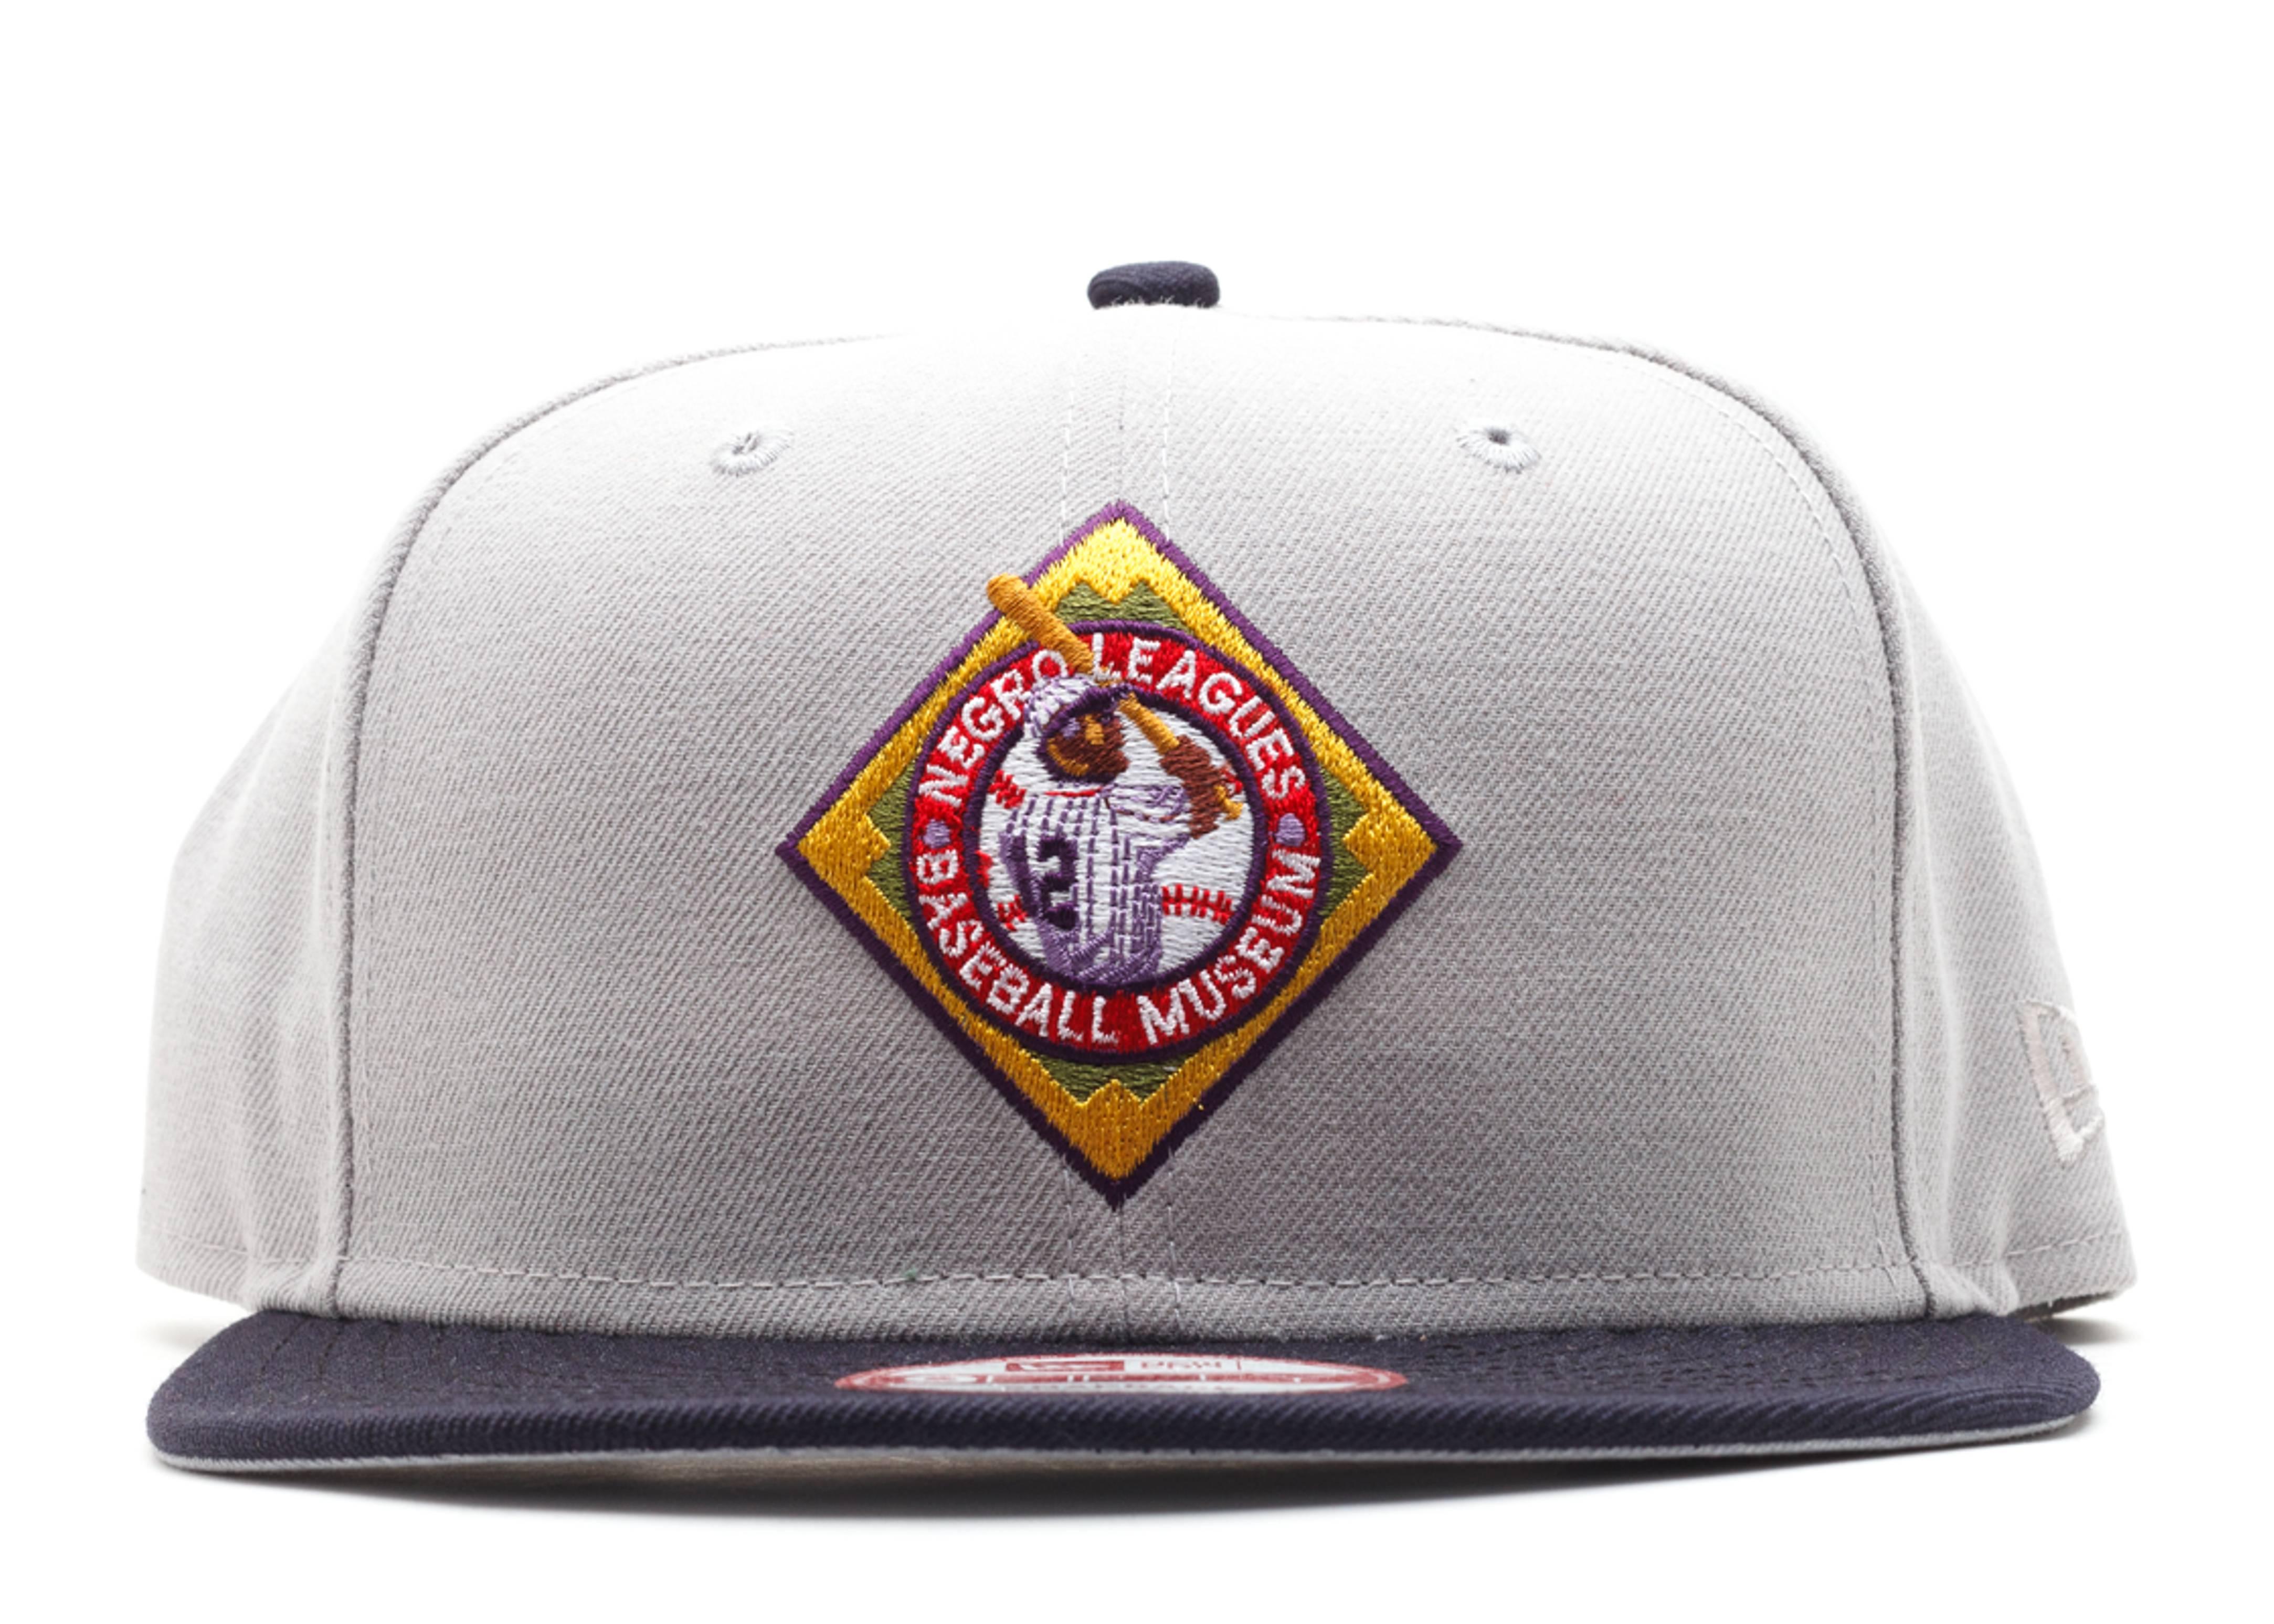 negro league baseball museum snap-back